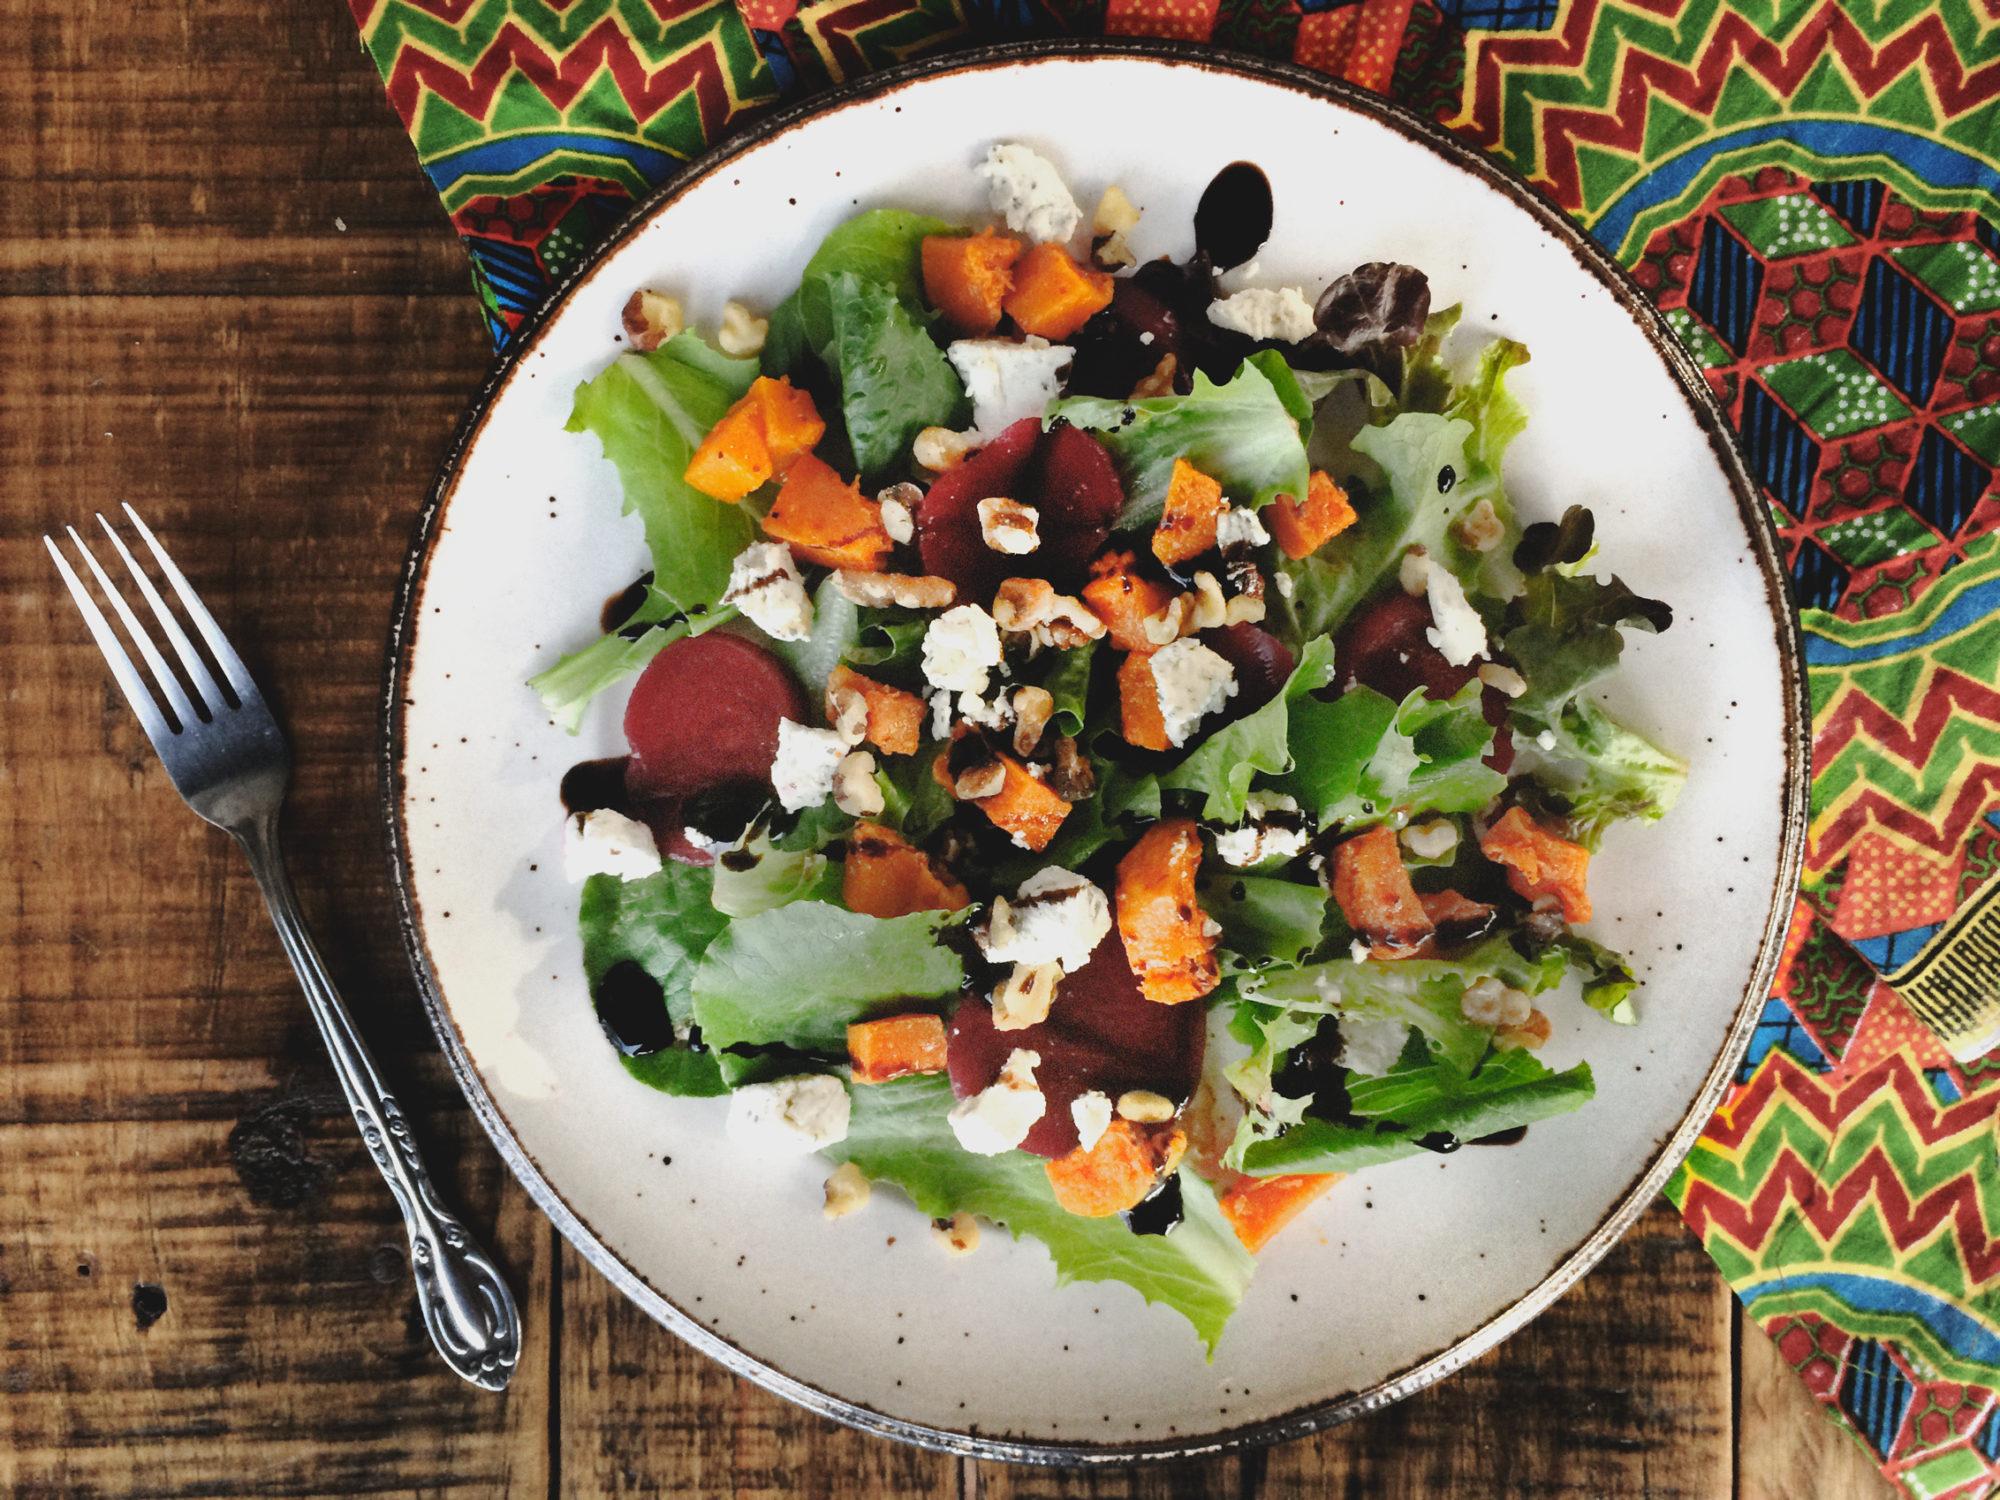 Roasted Butternut Squash Salad with Vegan Feta Cheese